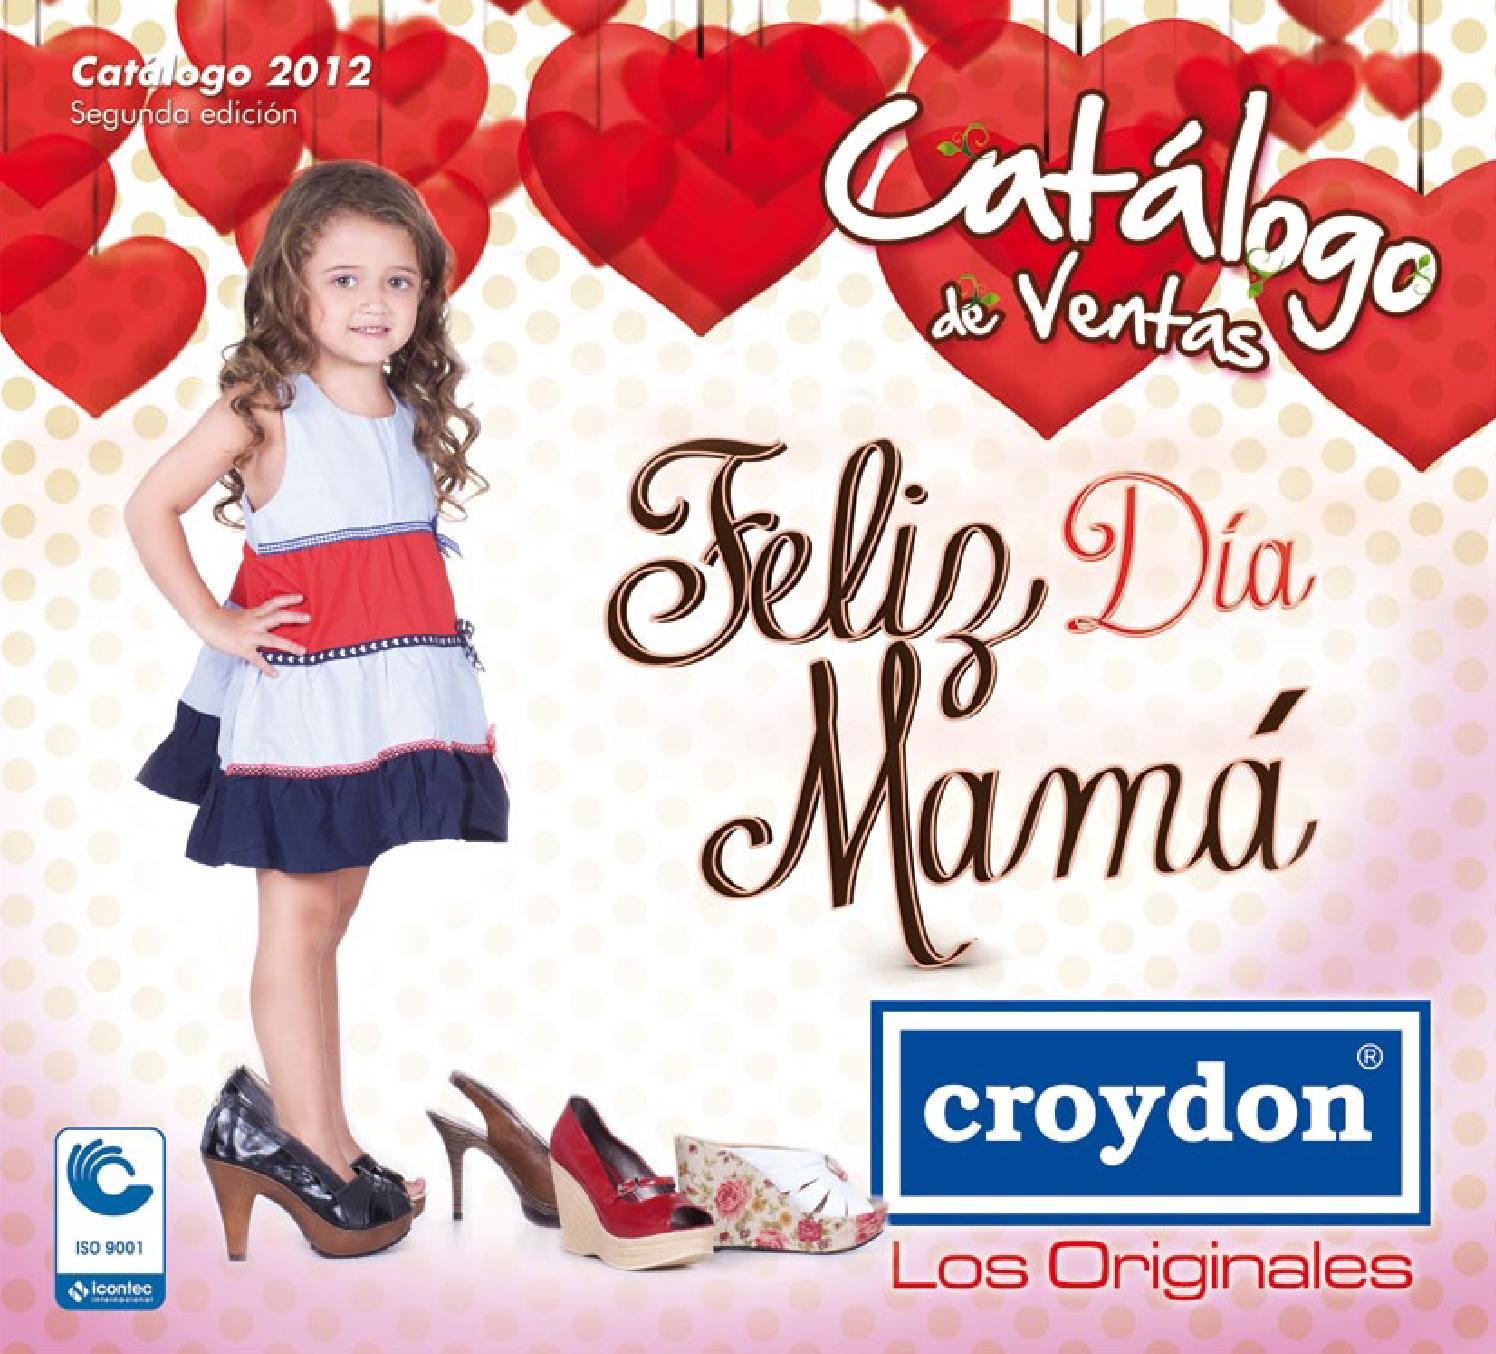 c7f7cb81b6 9 catálogo madres 2012 segunda edición by Ricardo Riaño - issuu